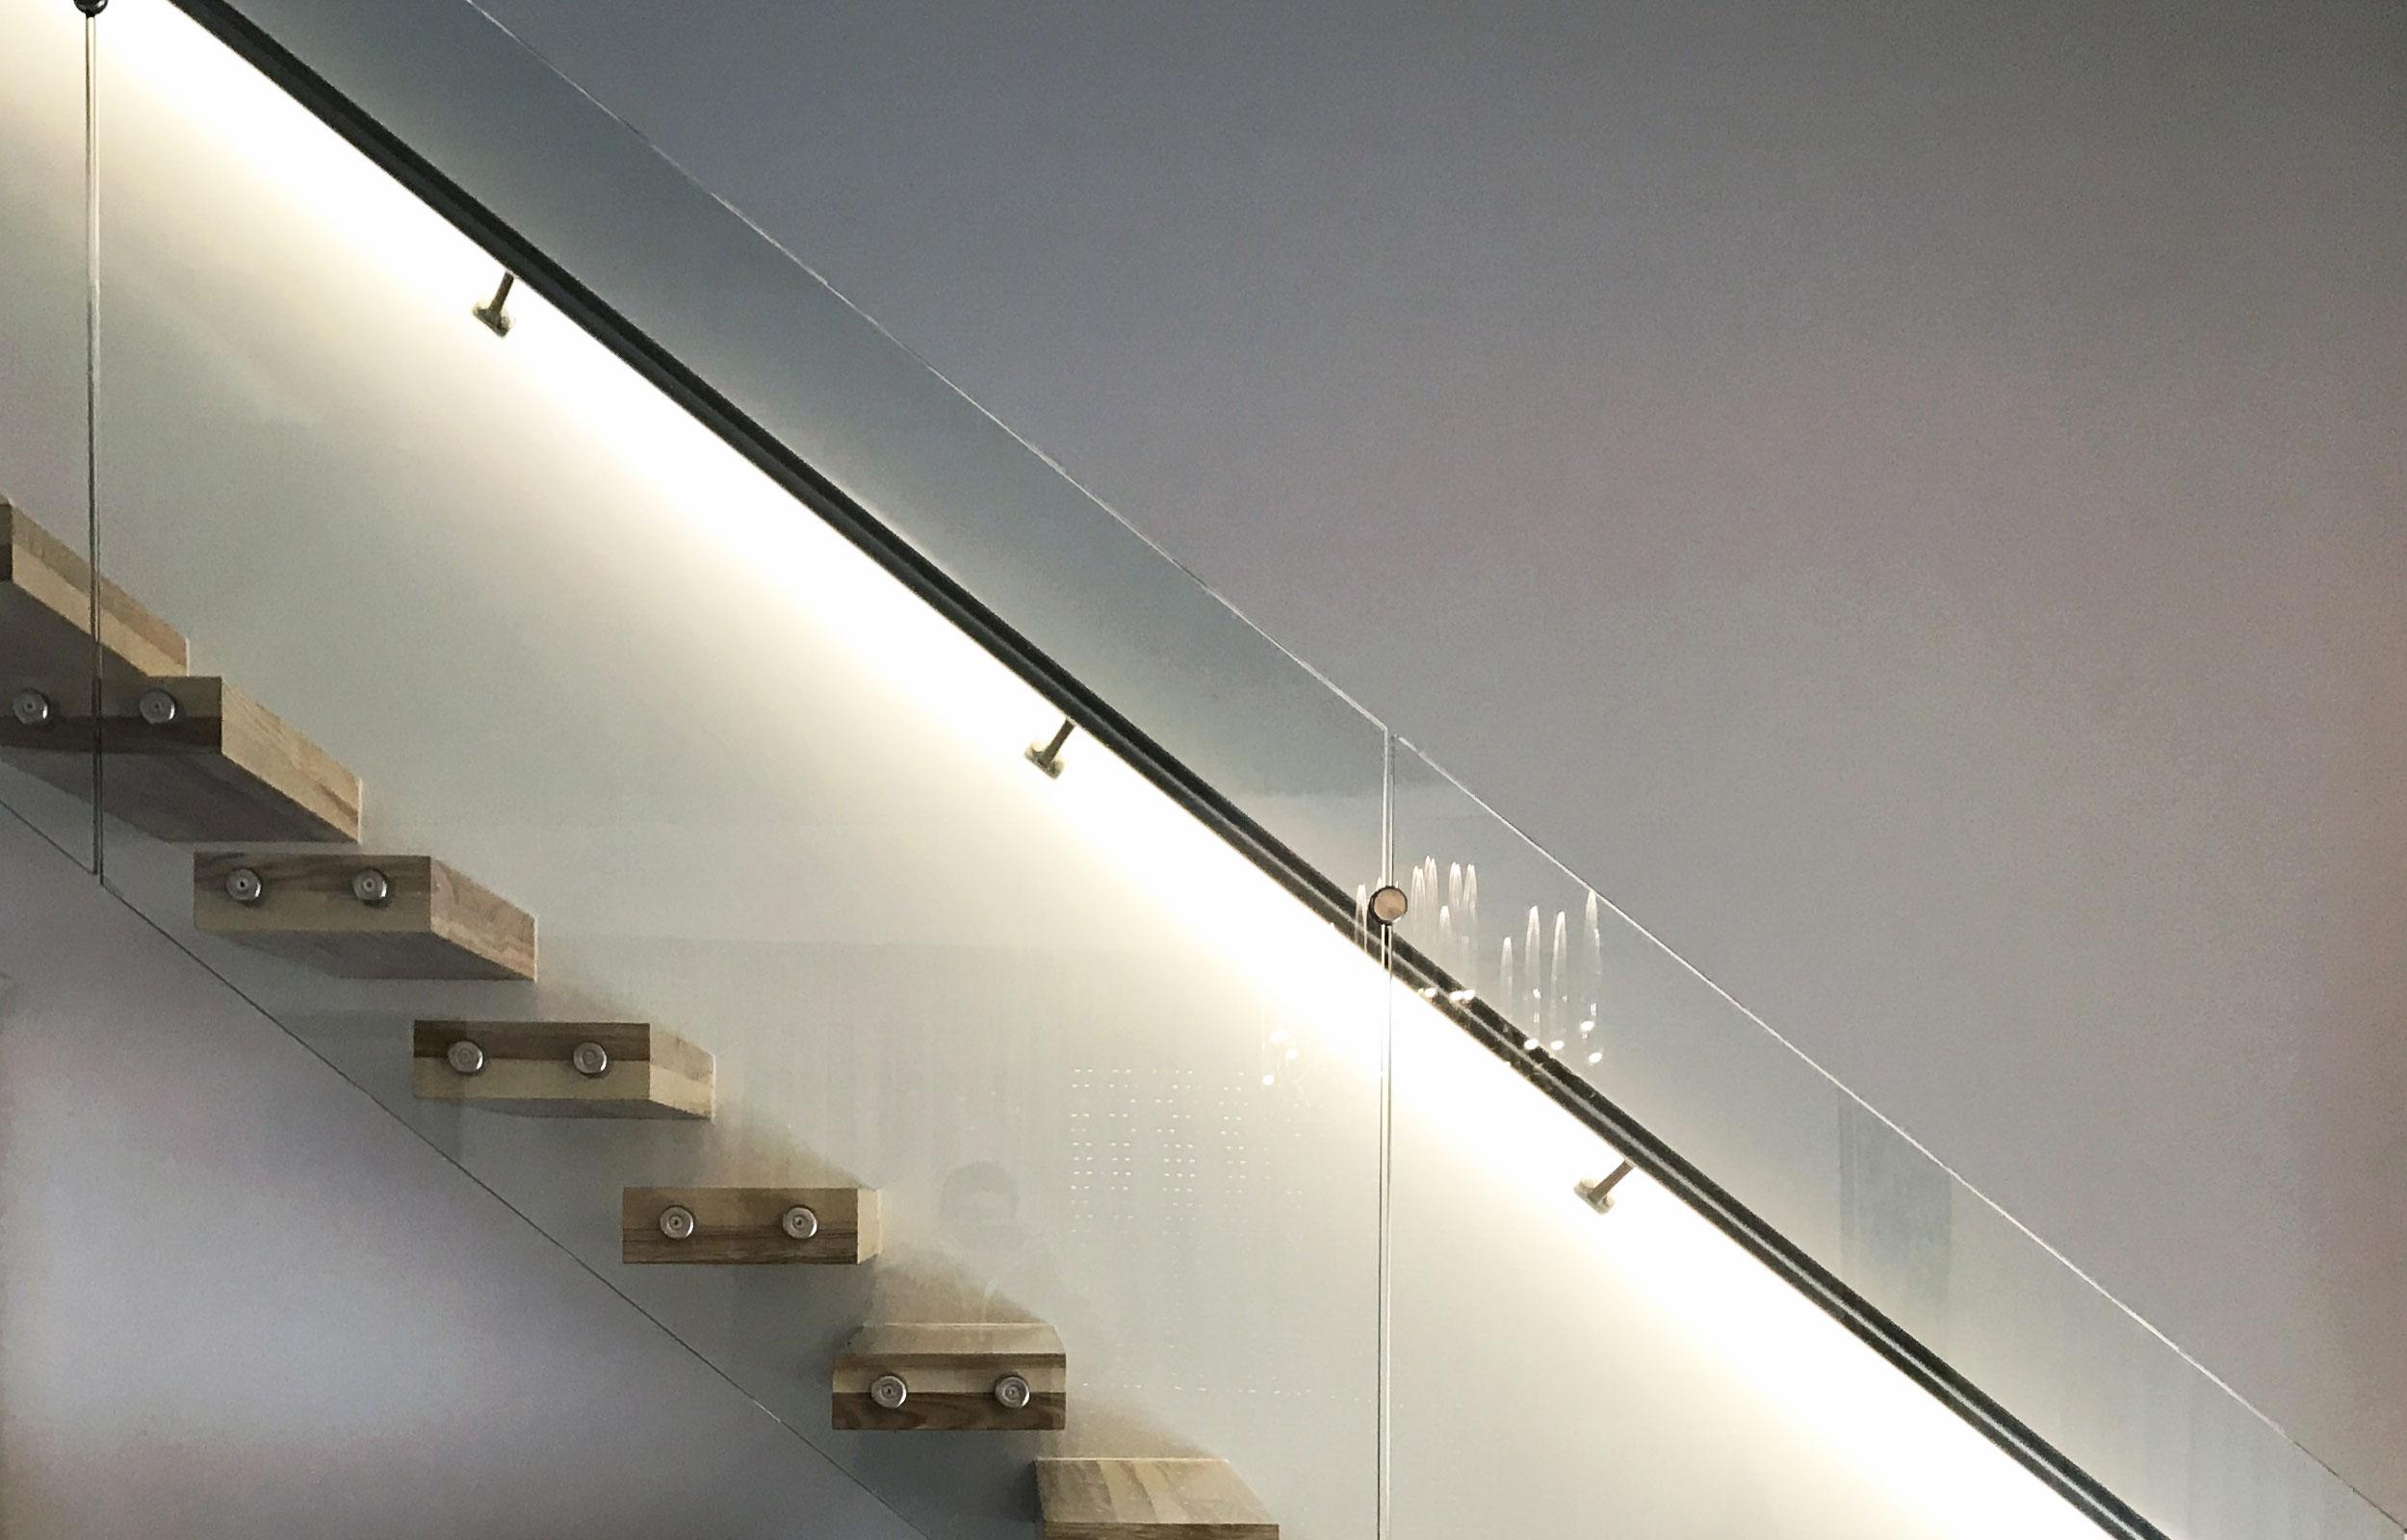 Scara interioara trepte consola balustrada sticla haute couture metal Serena